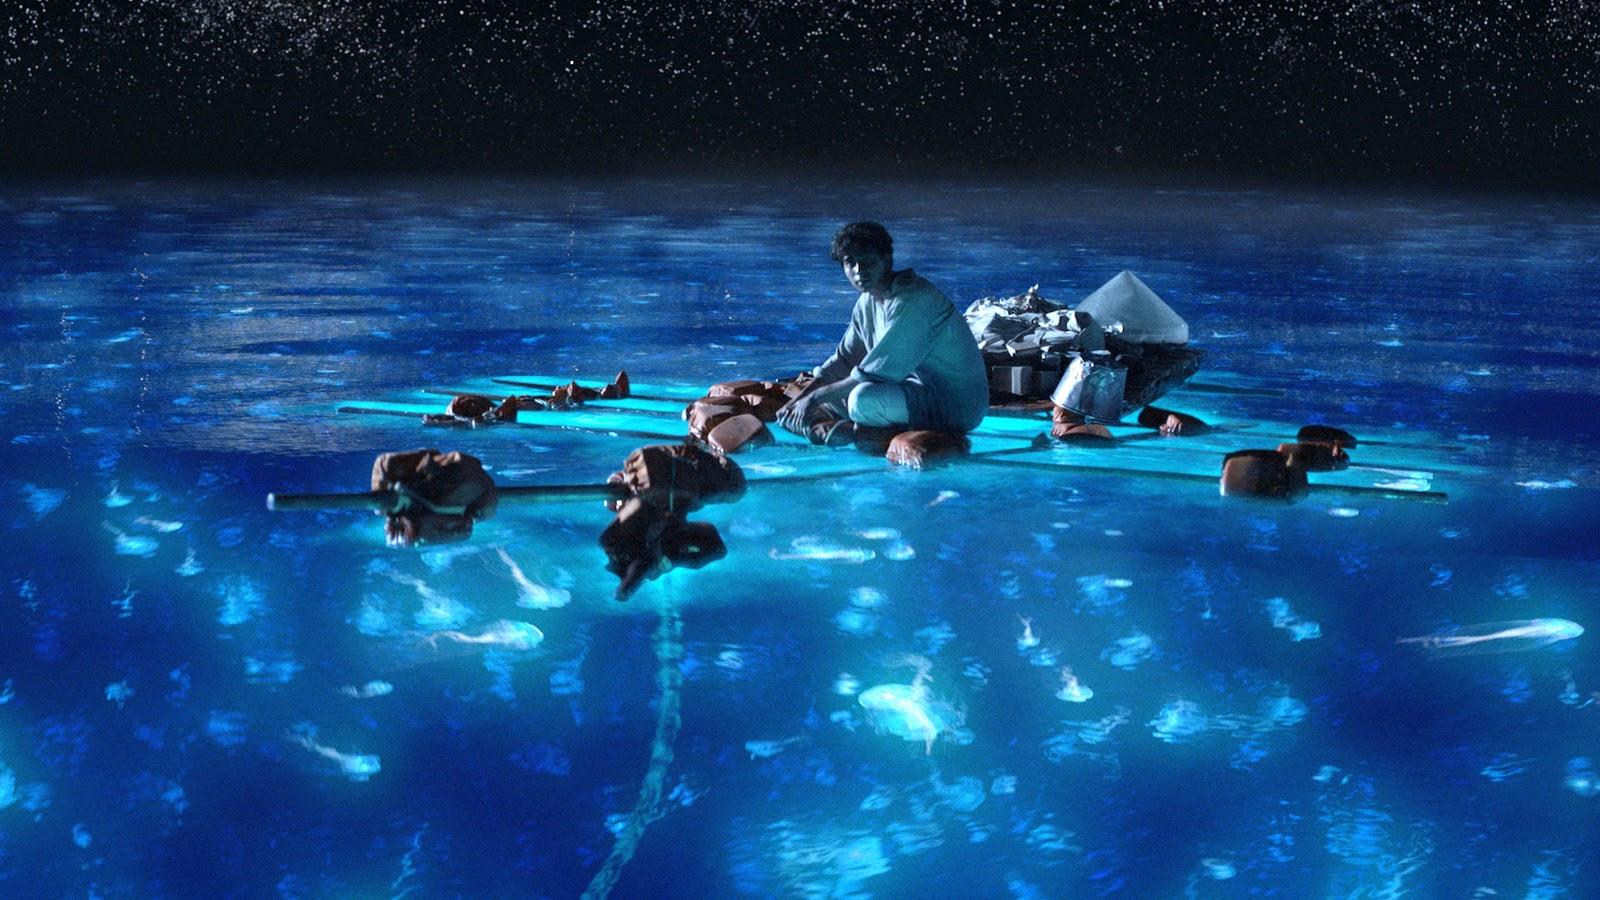 Phytoplankton To Illuminate His Protagonist